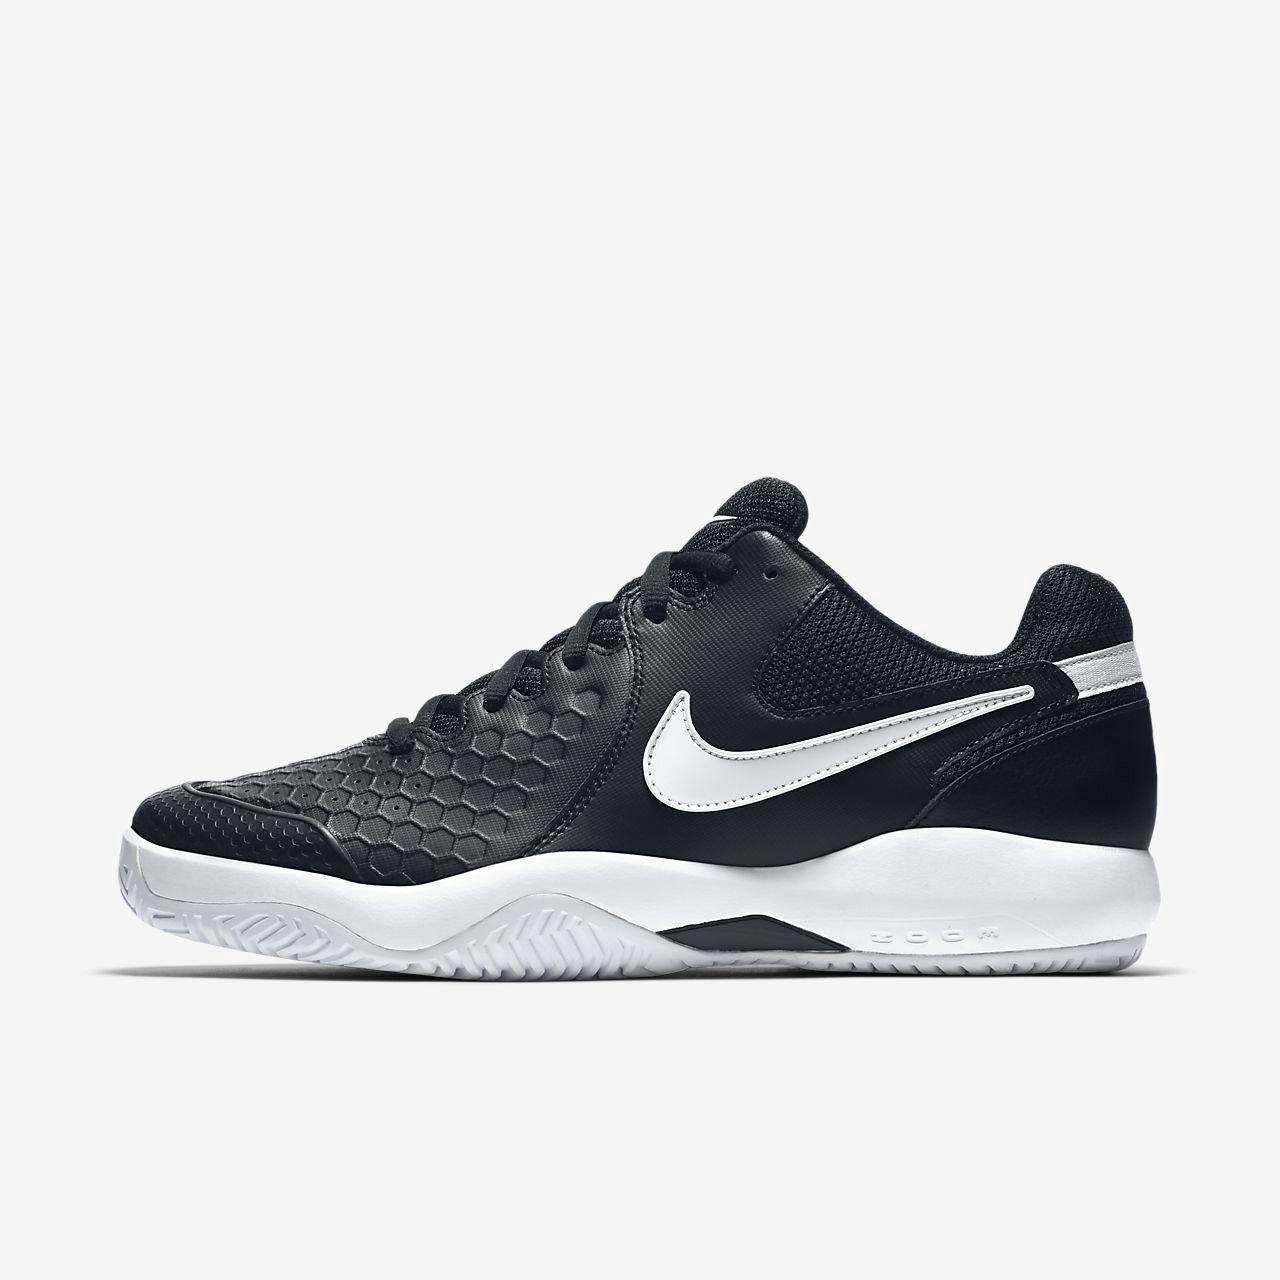 Mens nike shoes, Nike shoes outfits